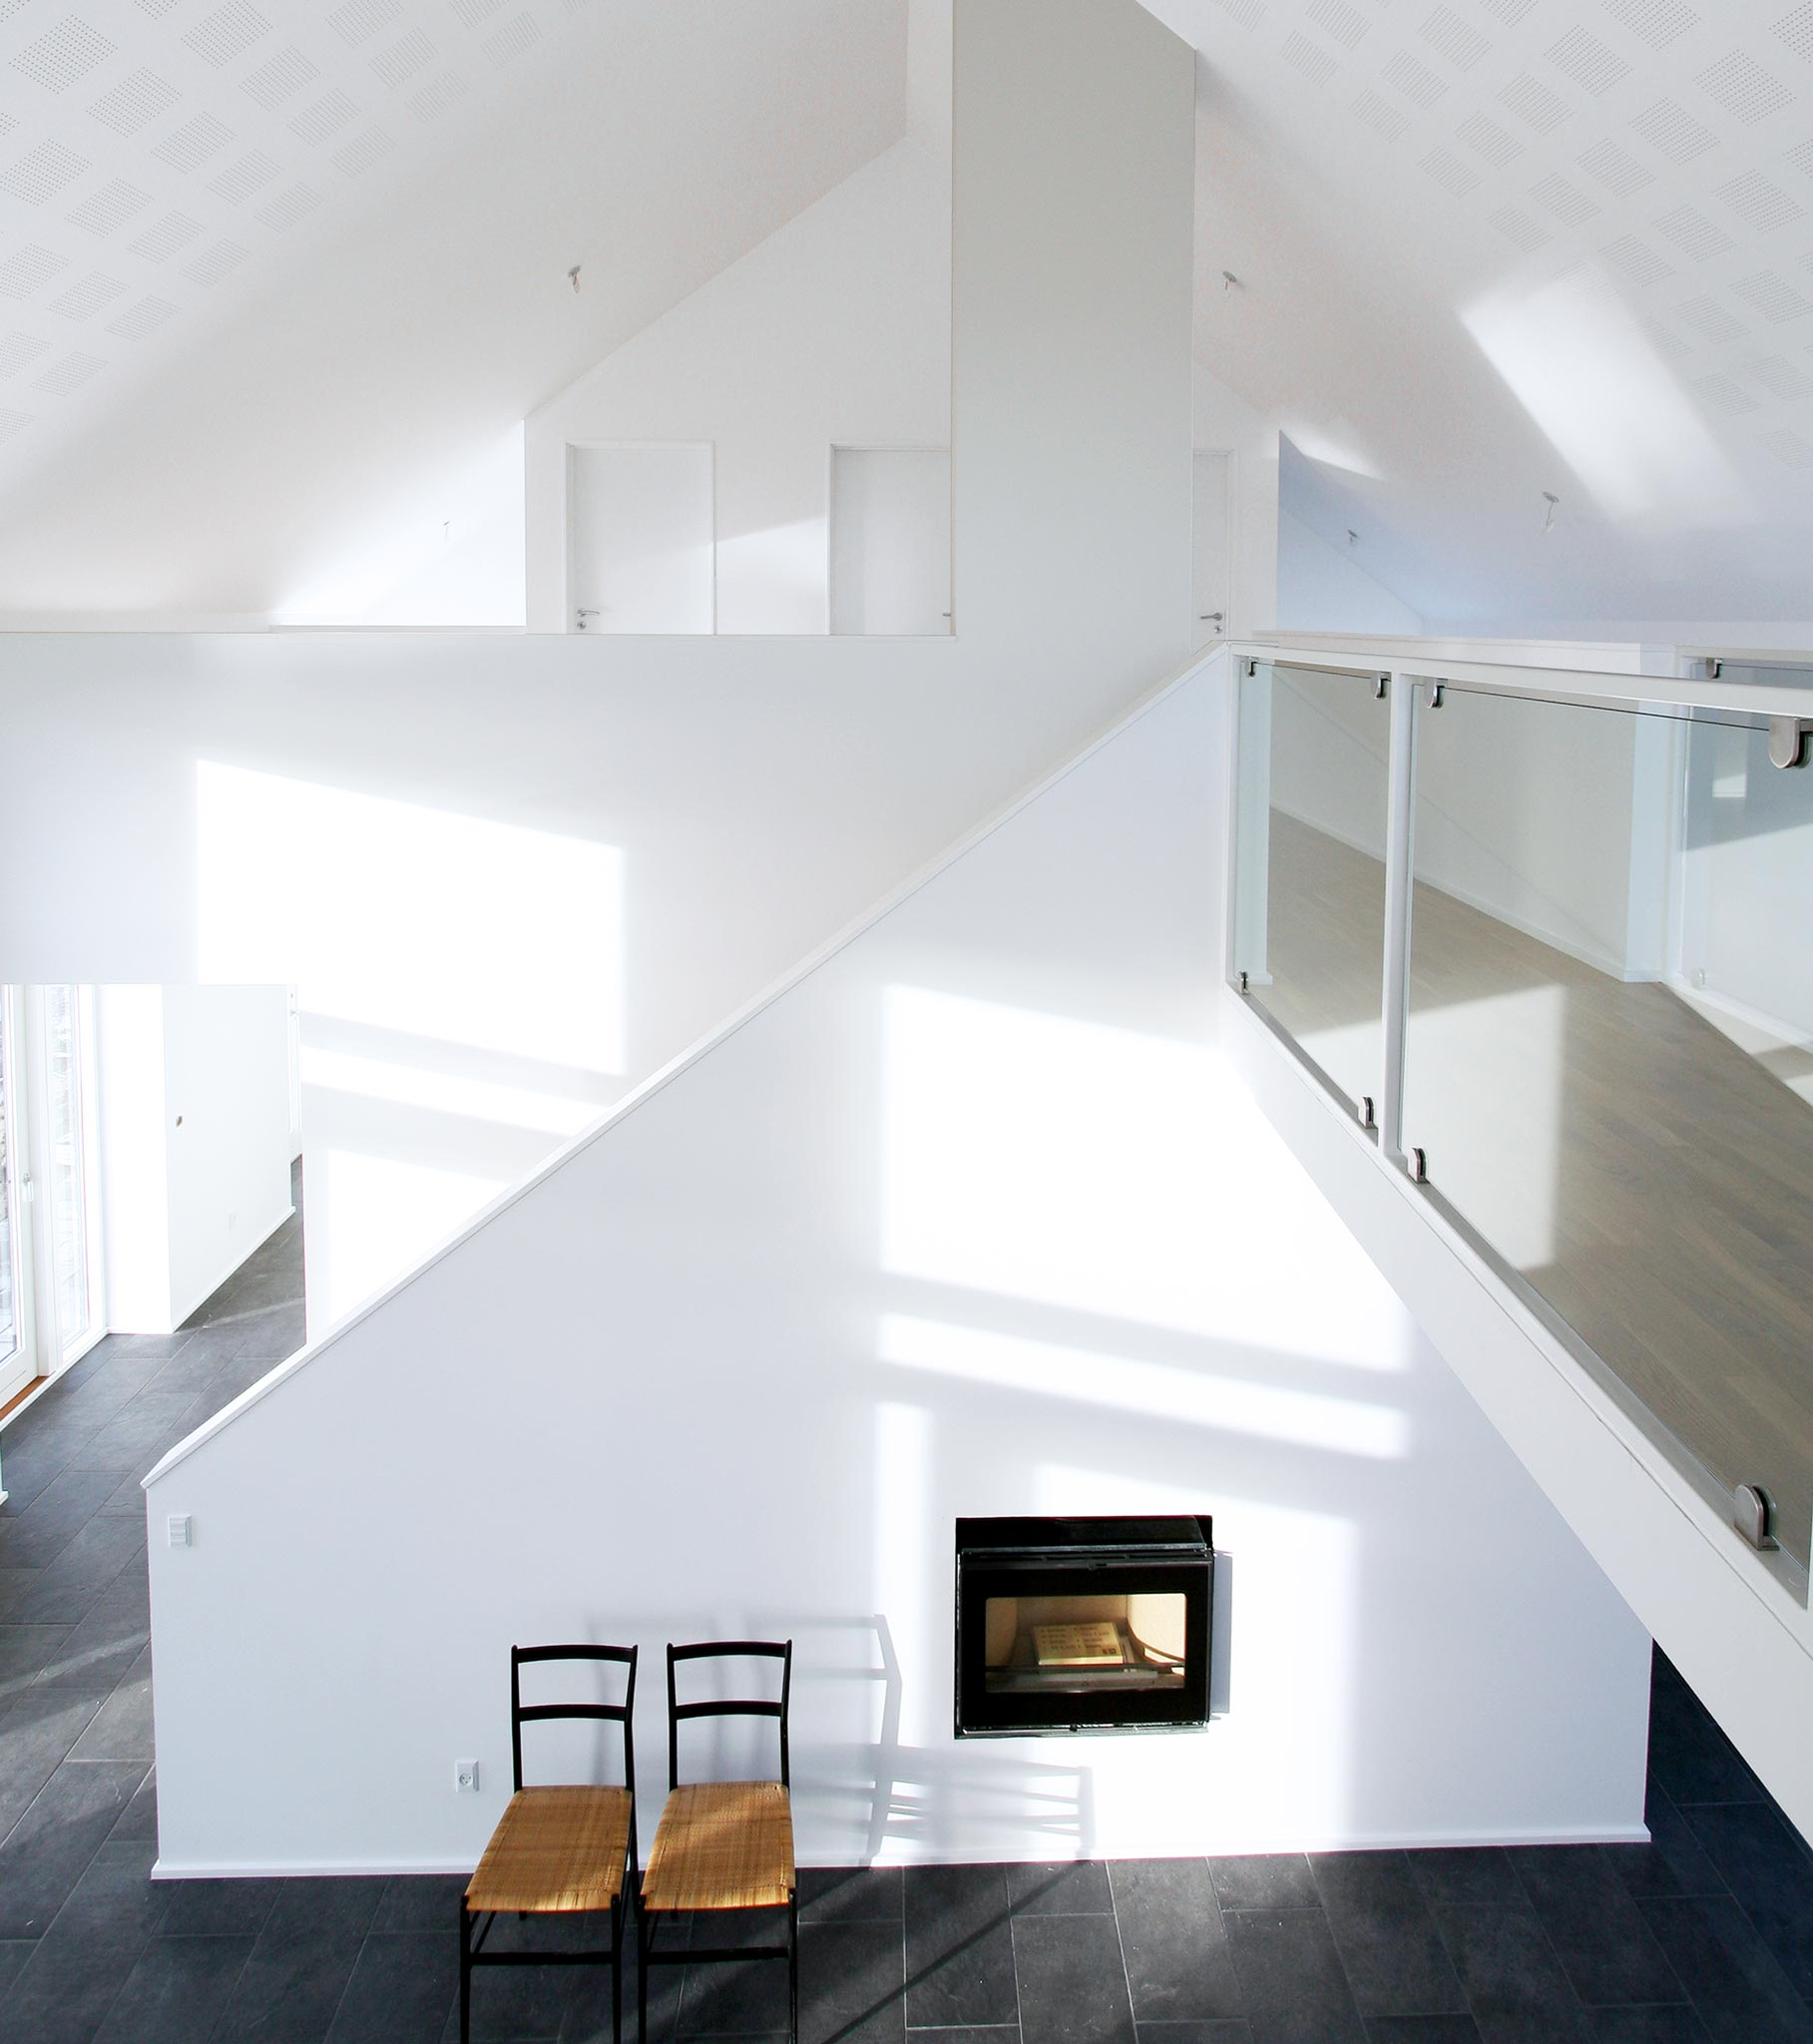 oneroom_arkitekttegnet_in_02.jpeg